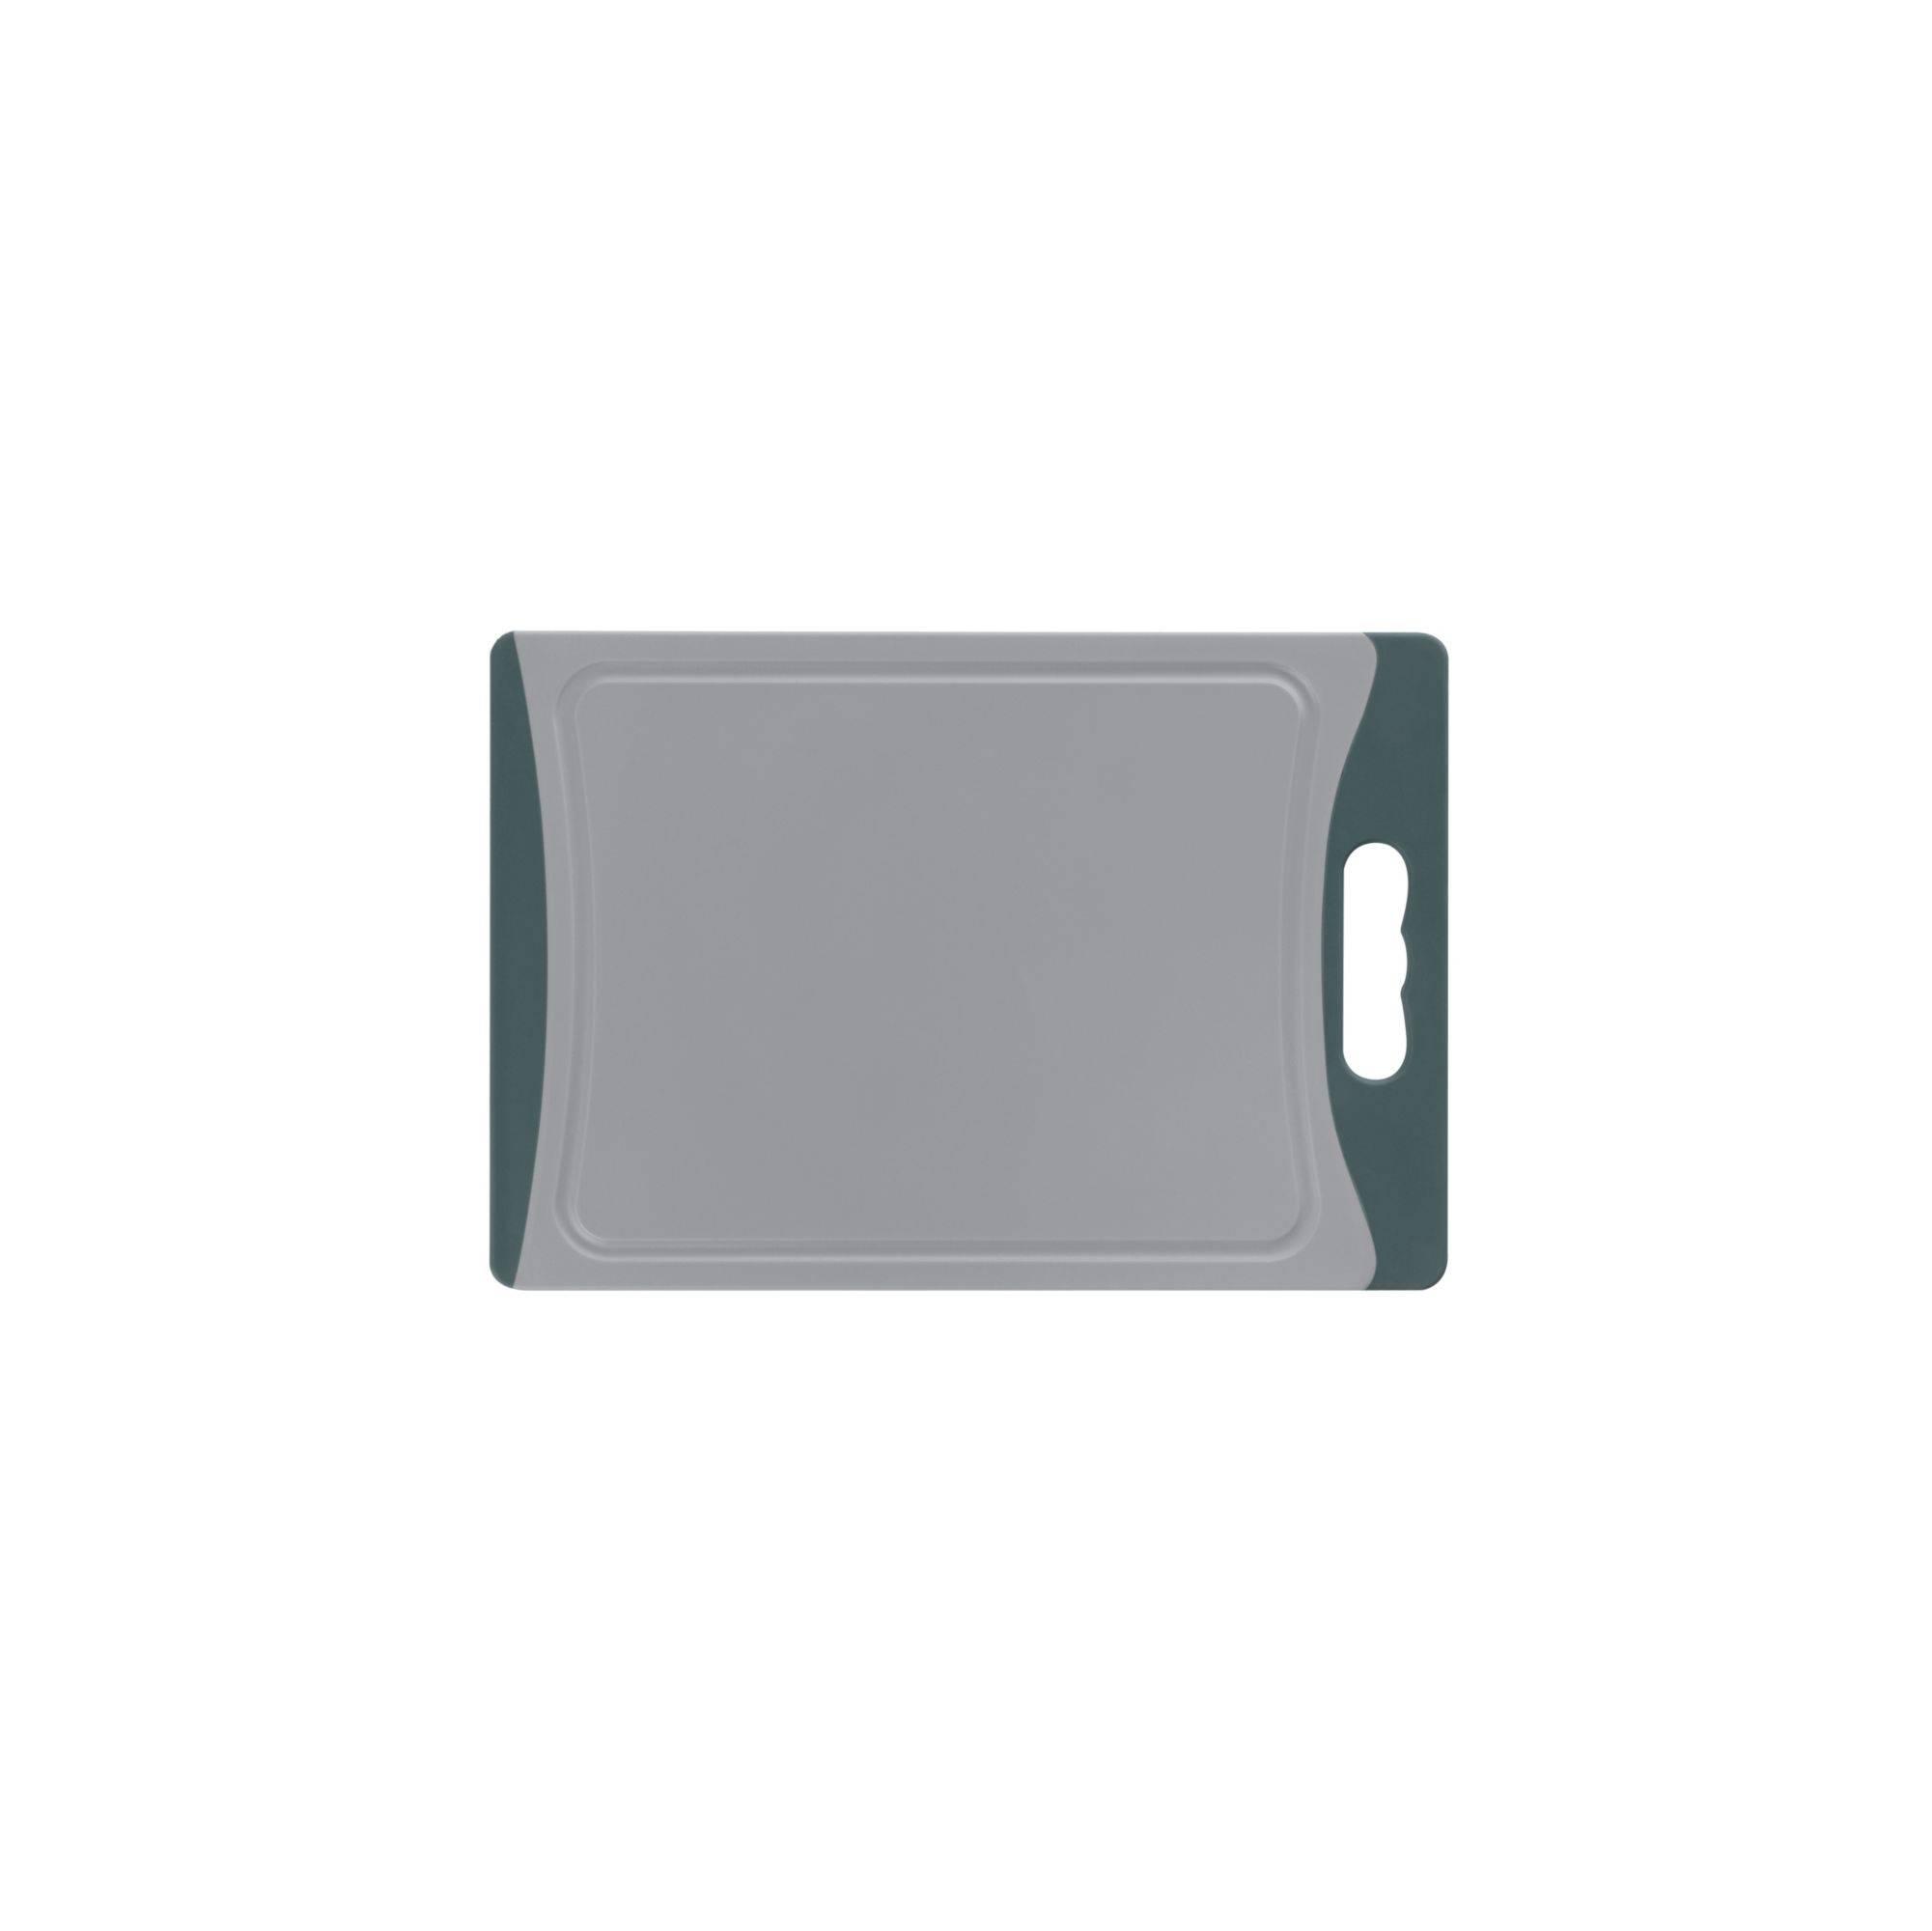 Prkénko na krájení plast LEIKA 25x16x0,9cm KL-11420